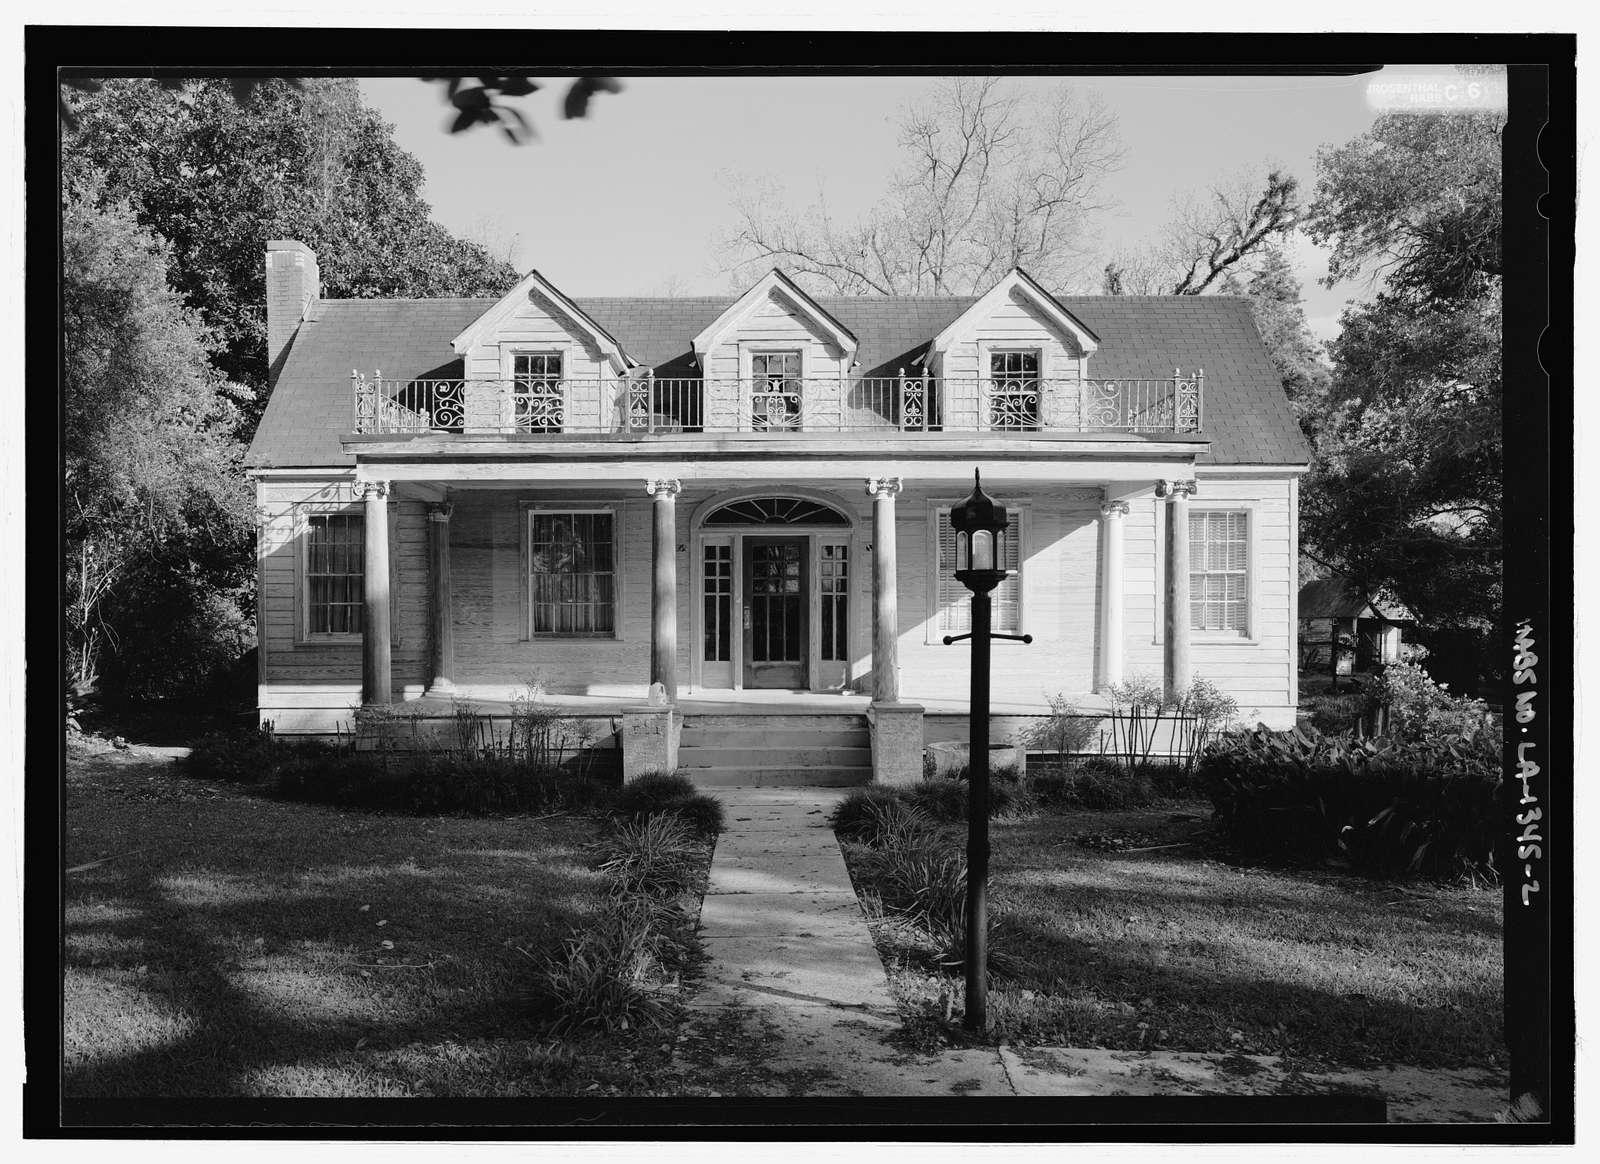 Cohen Plantation, 4397 Louisiana State Highway 119, Melrose, Natchitoches Parish, LA